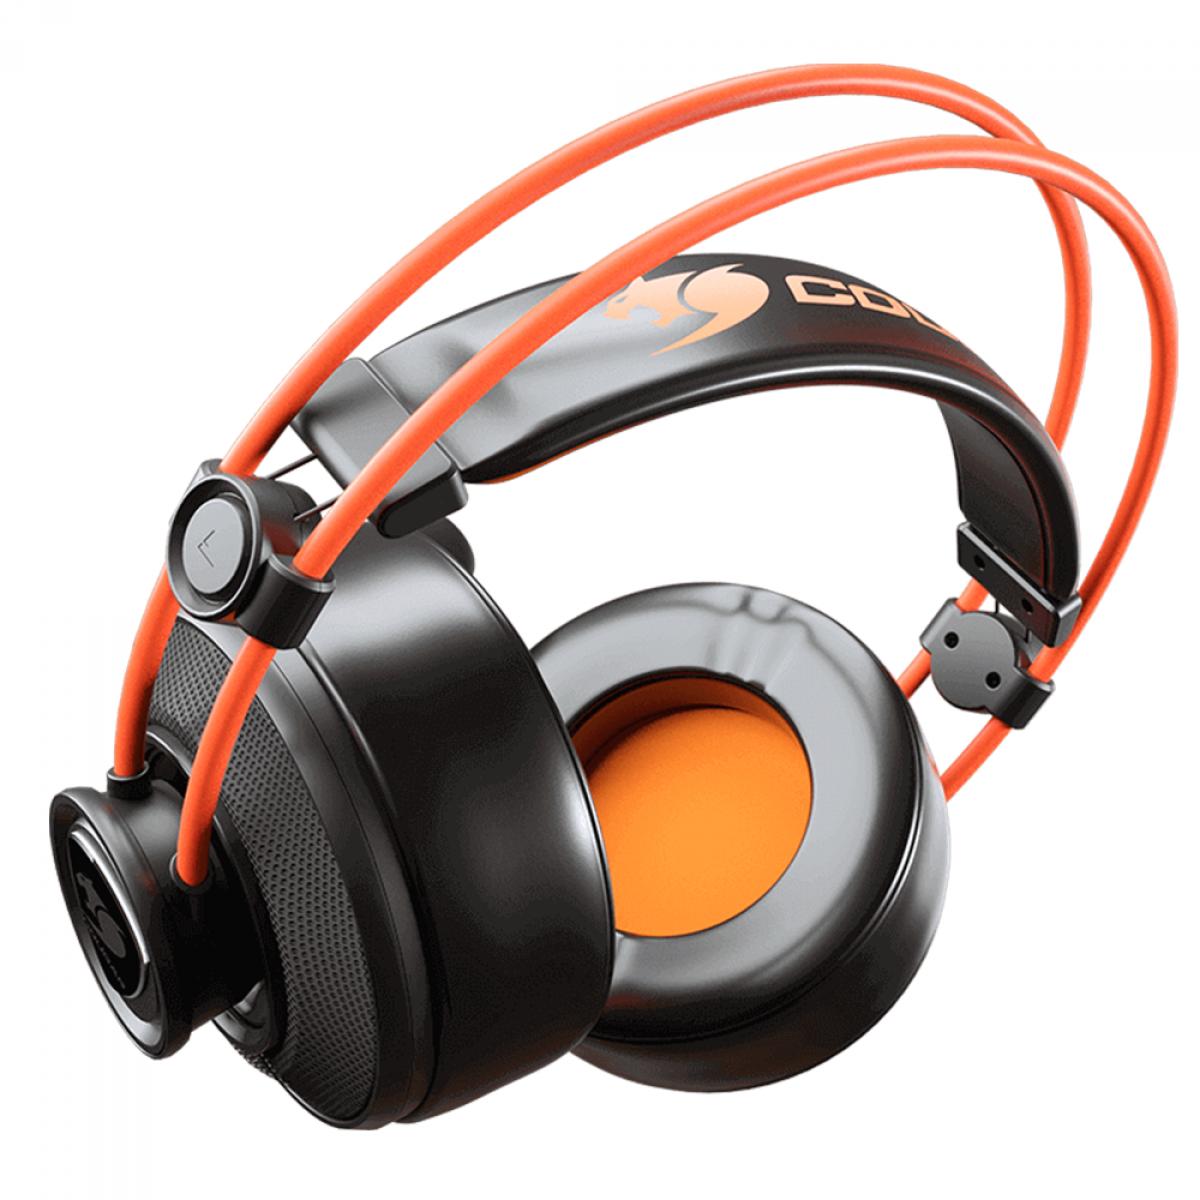 Headset Gamer Cougar Immersa Ti, 3.5mm, Multi Plataforma, CGR-P40NB-310